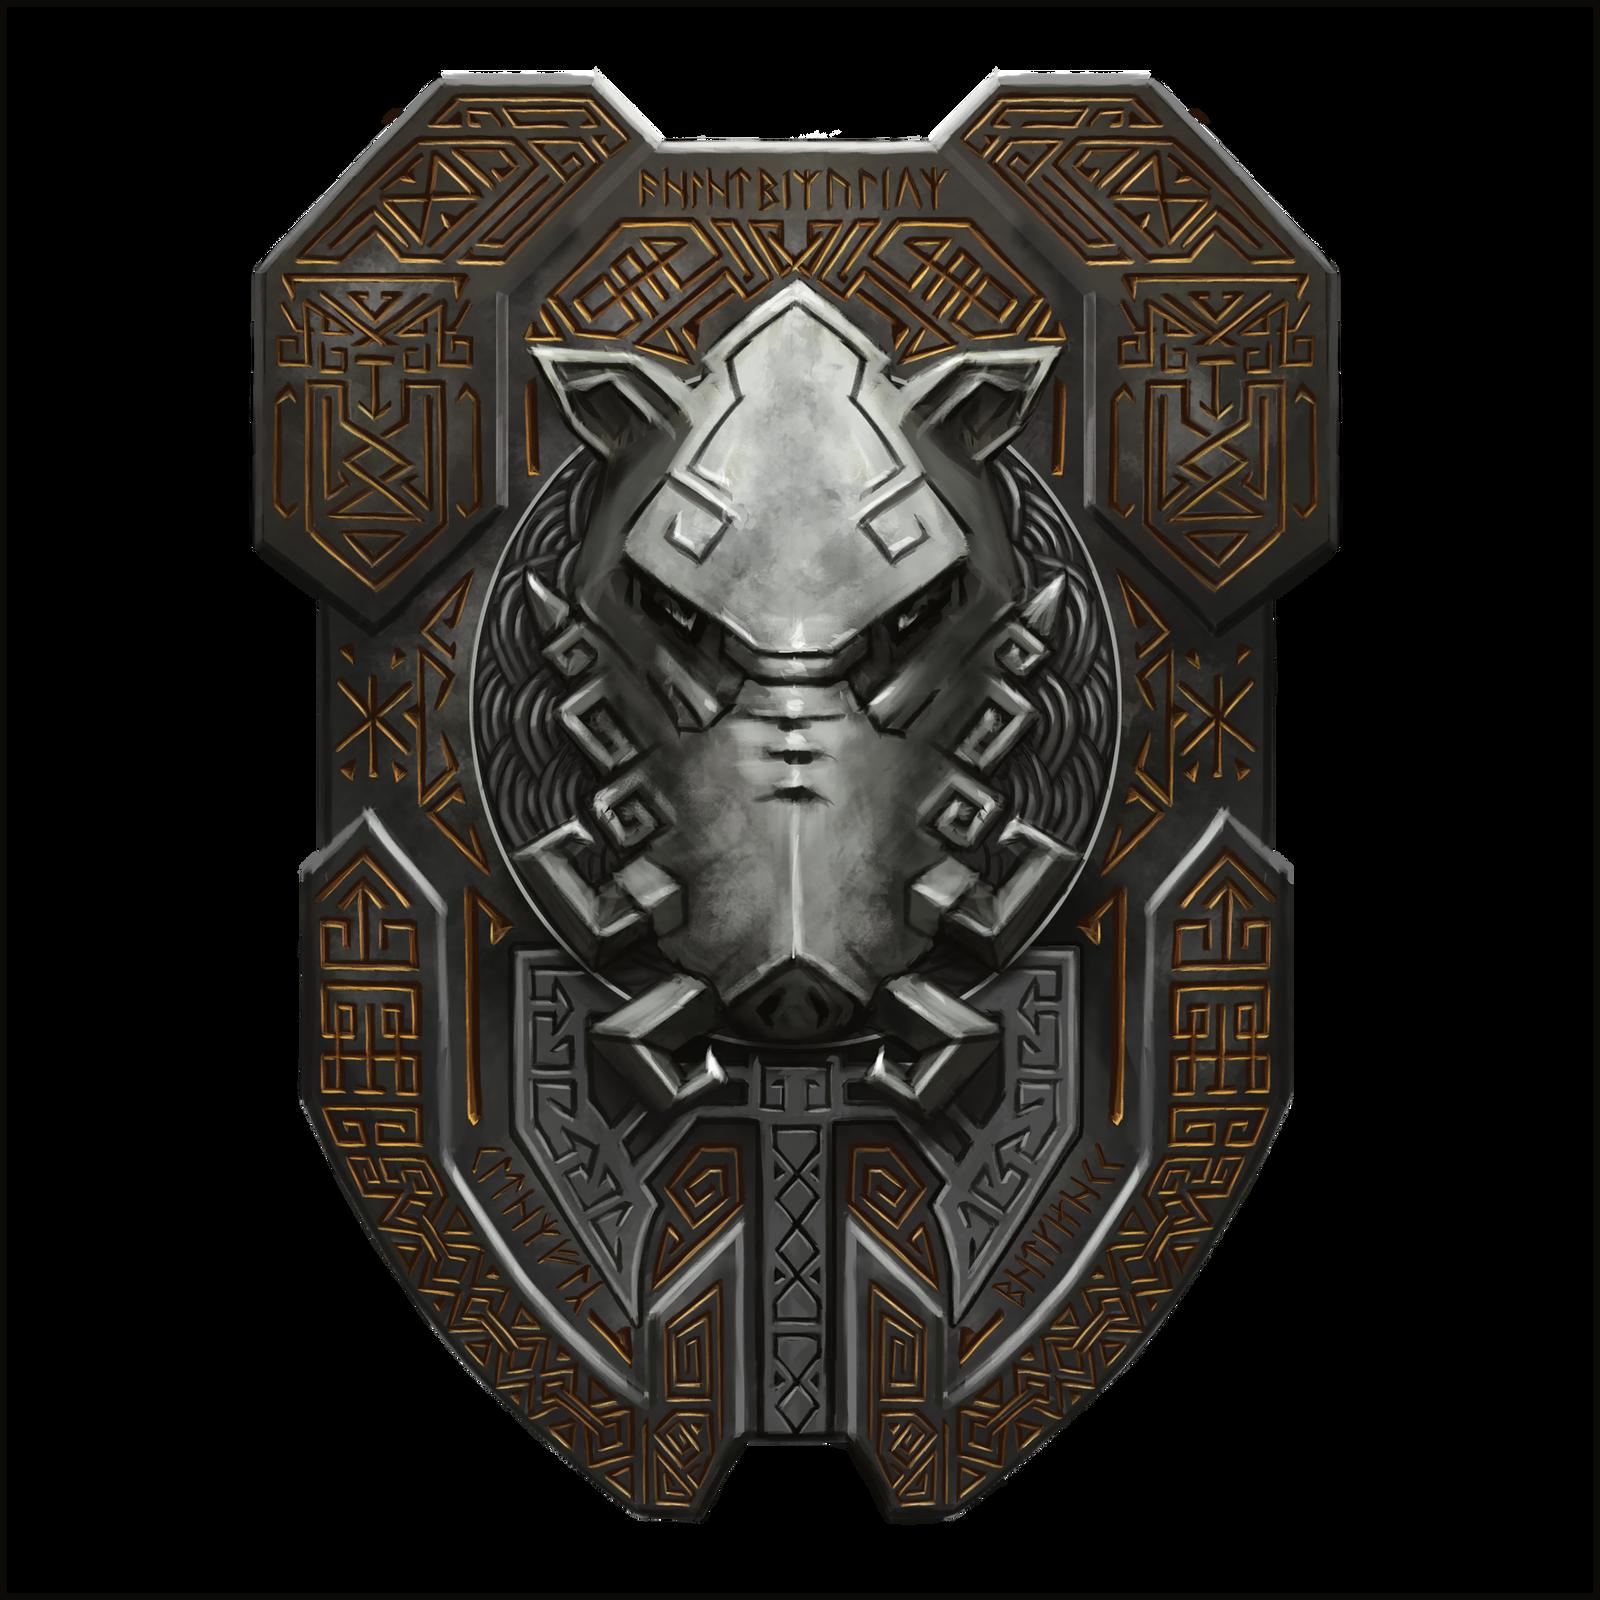 Boucliers et protections Dwarf_boar_shield_21_by_cyderak-d9i8n24